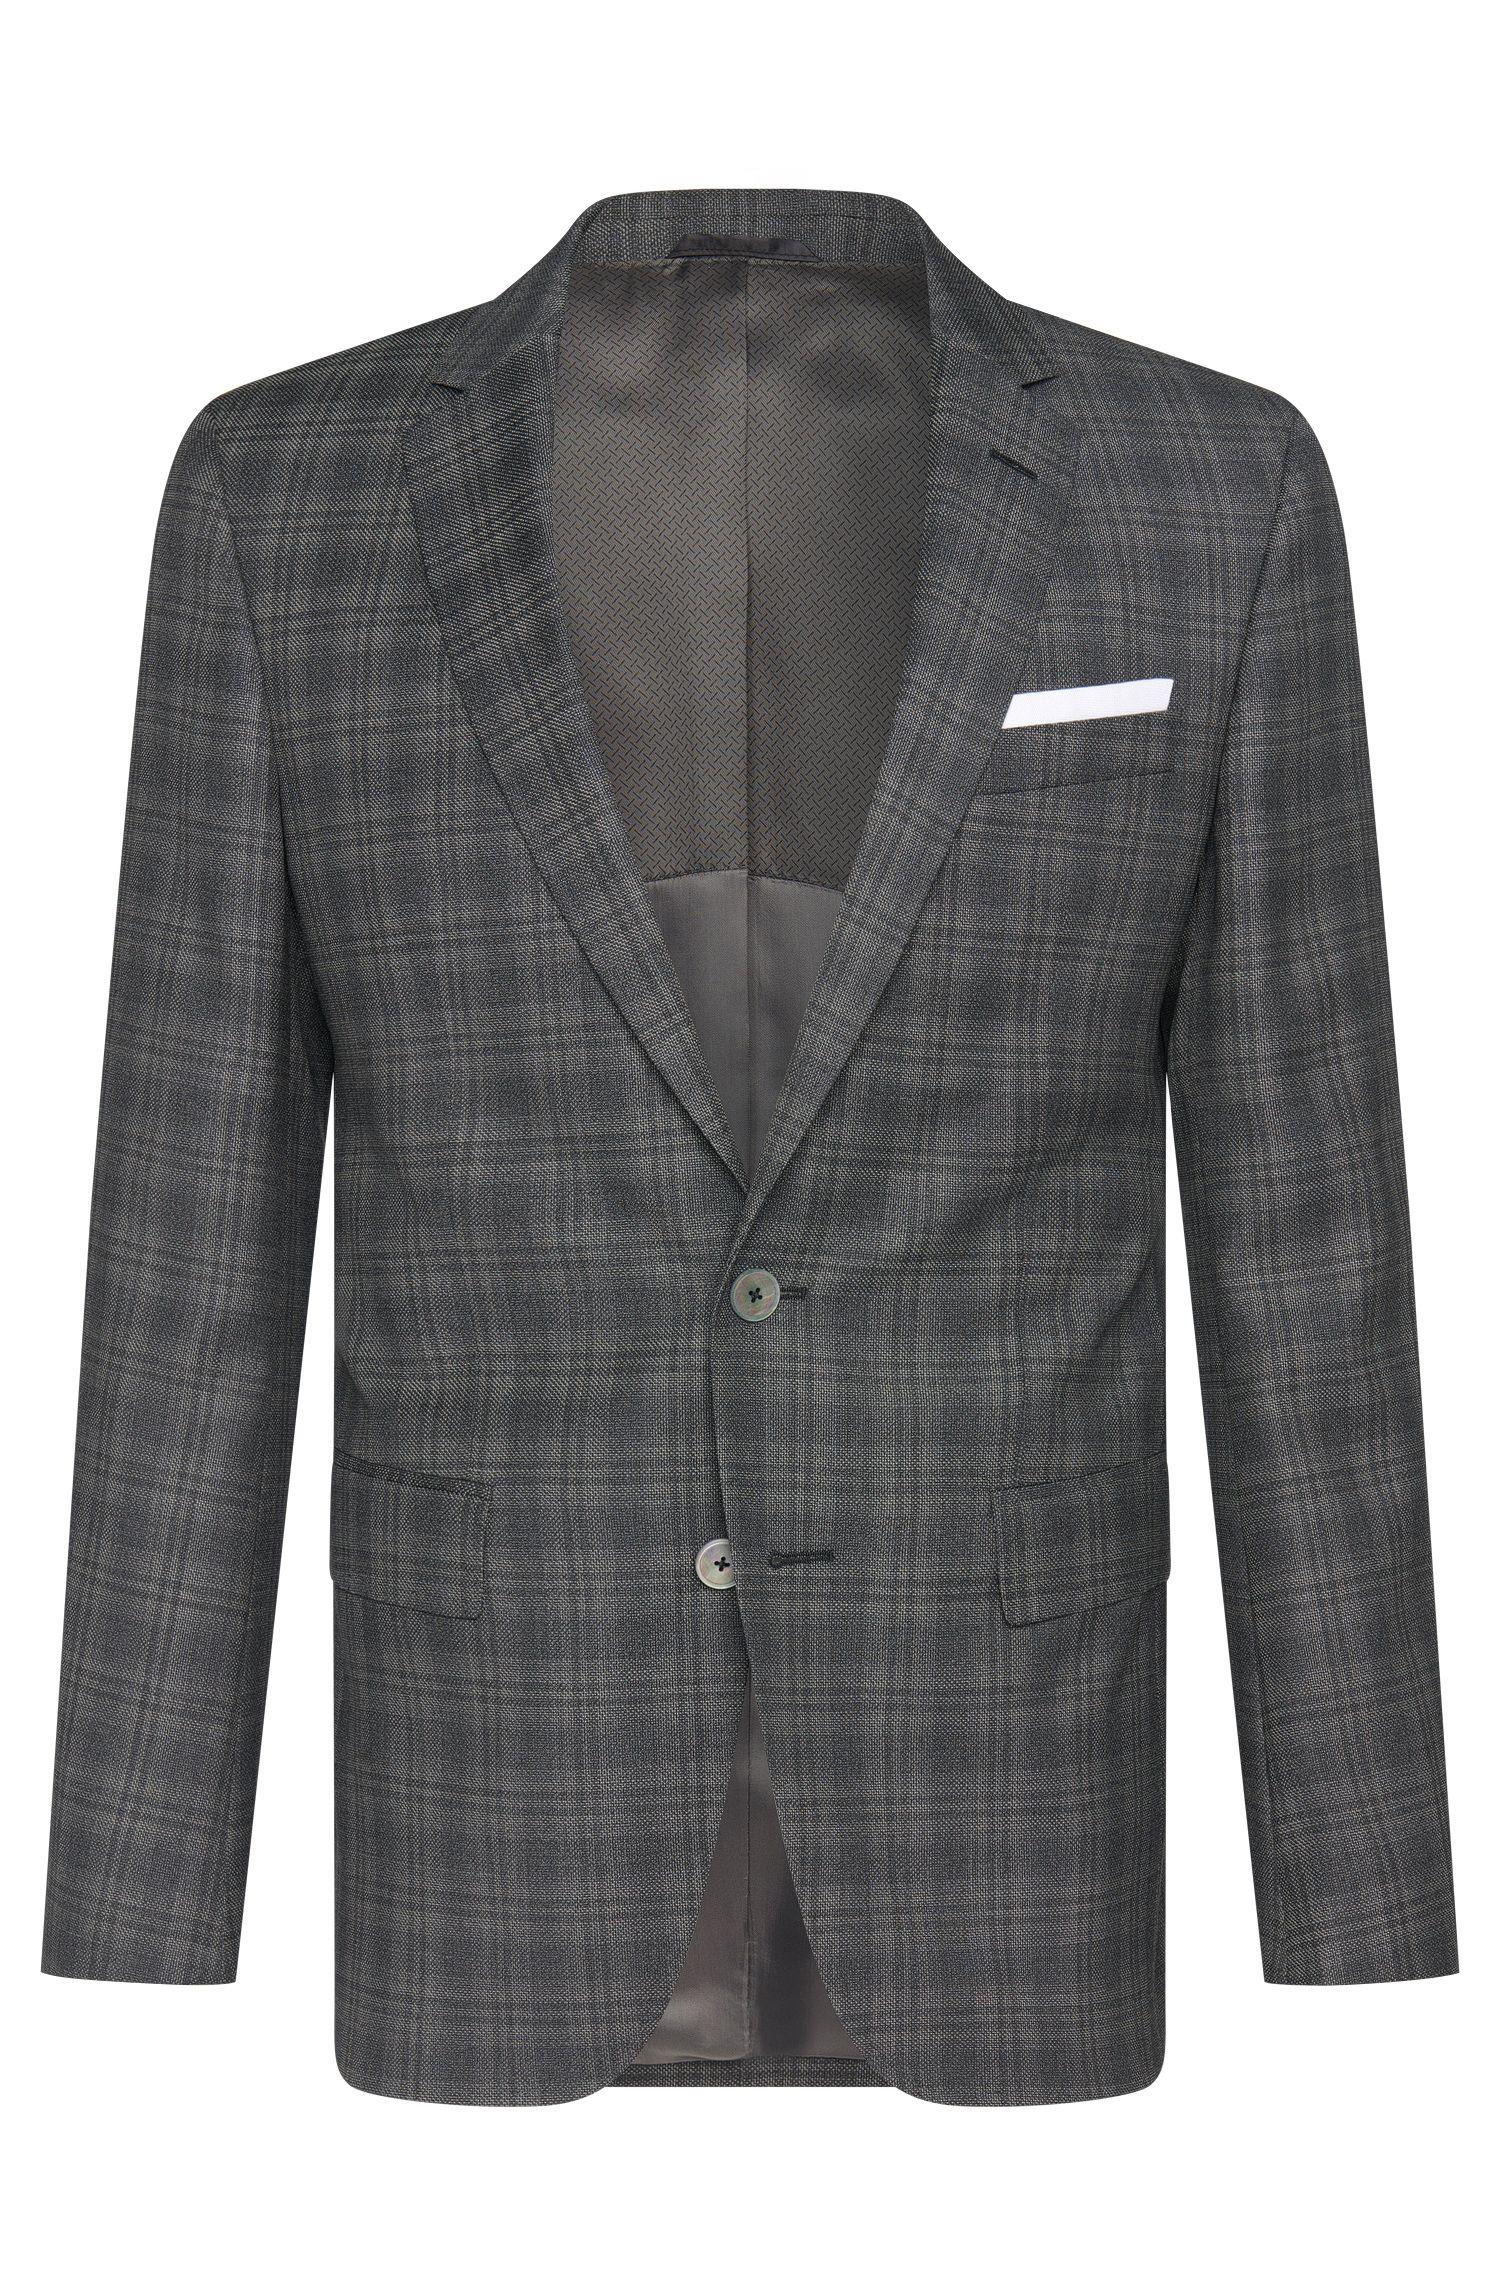 'Hutsons' | Slim Fit, Super 100 Italian Virgin Wool Sport Coat